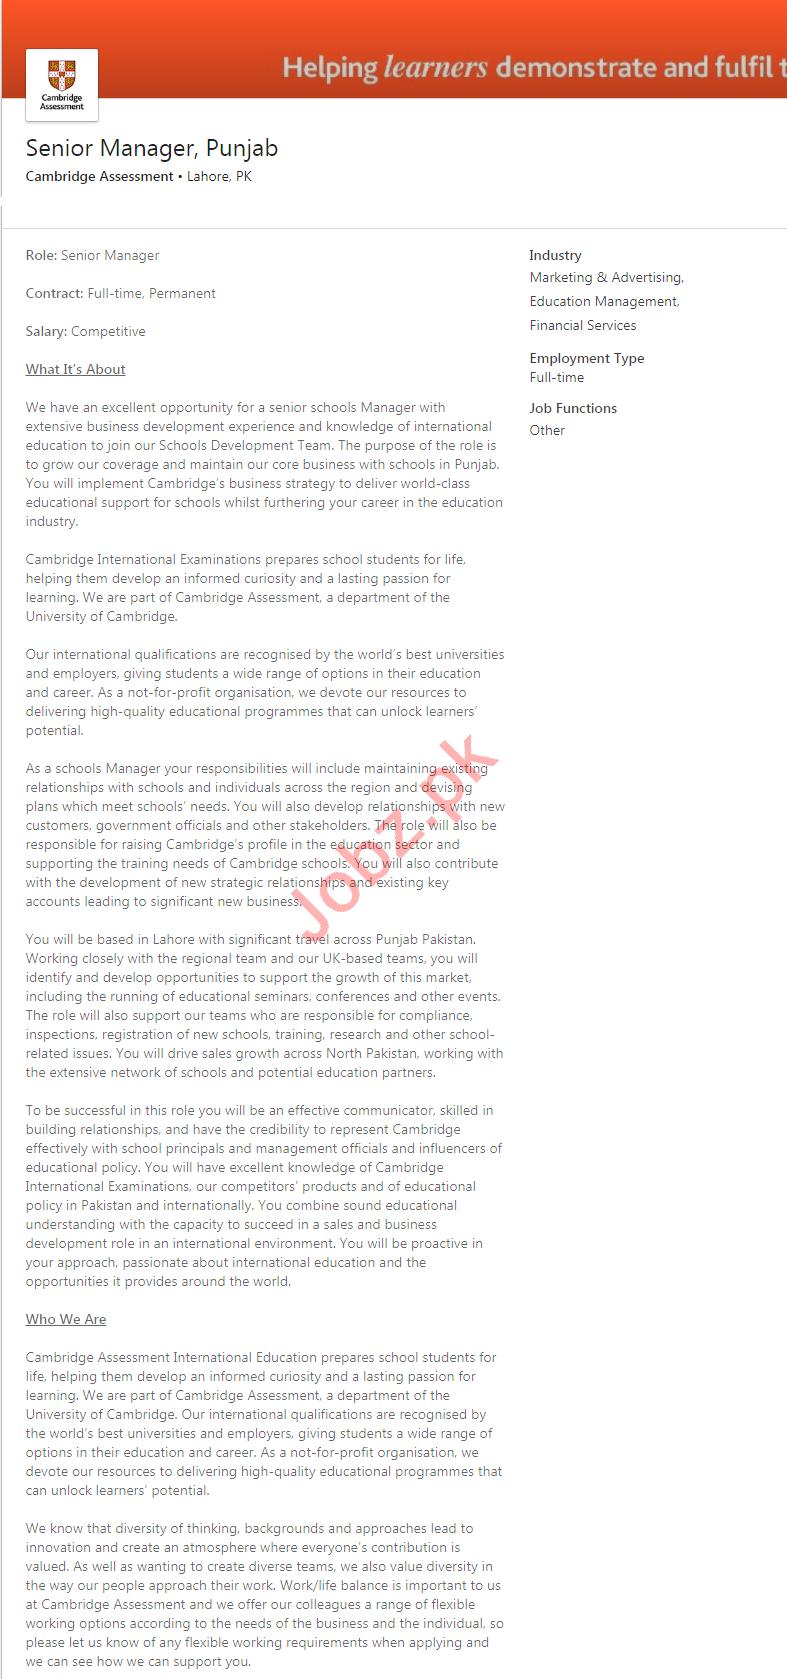 Cambridge Assessment Lahore Jobs 2020 Senior Manager